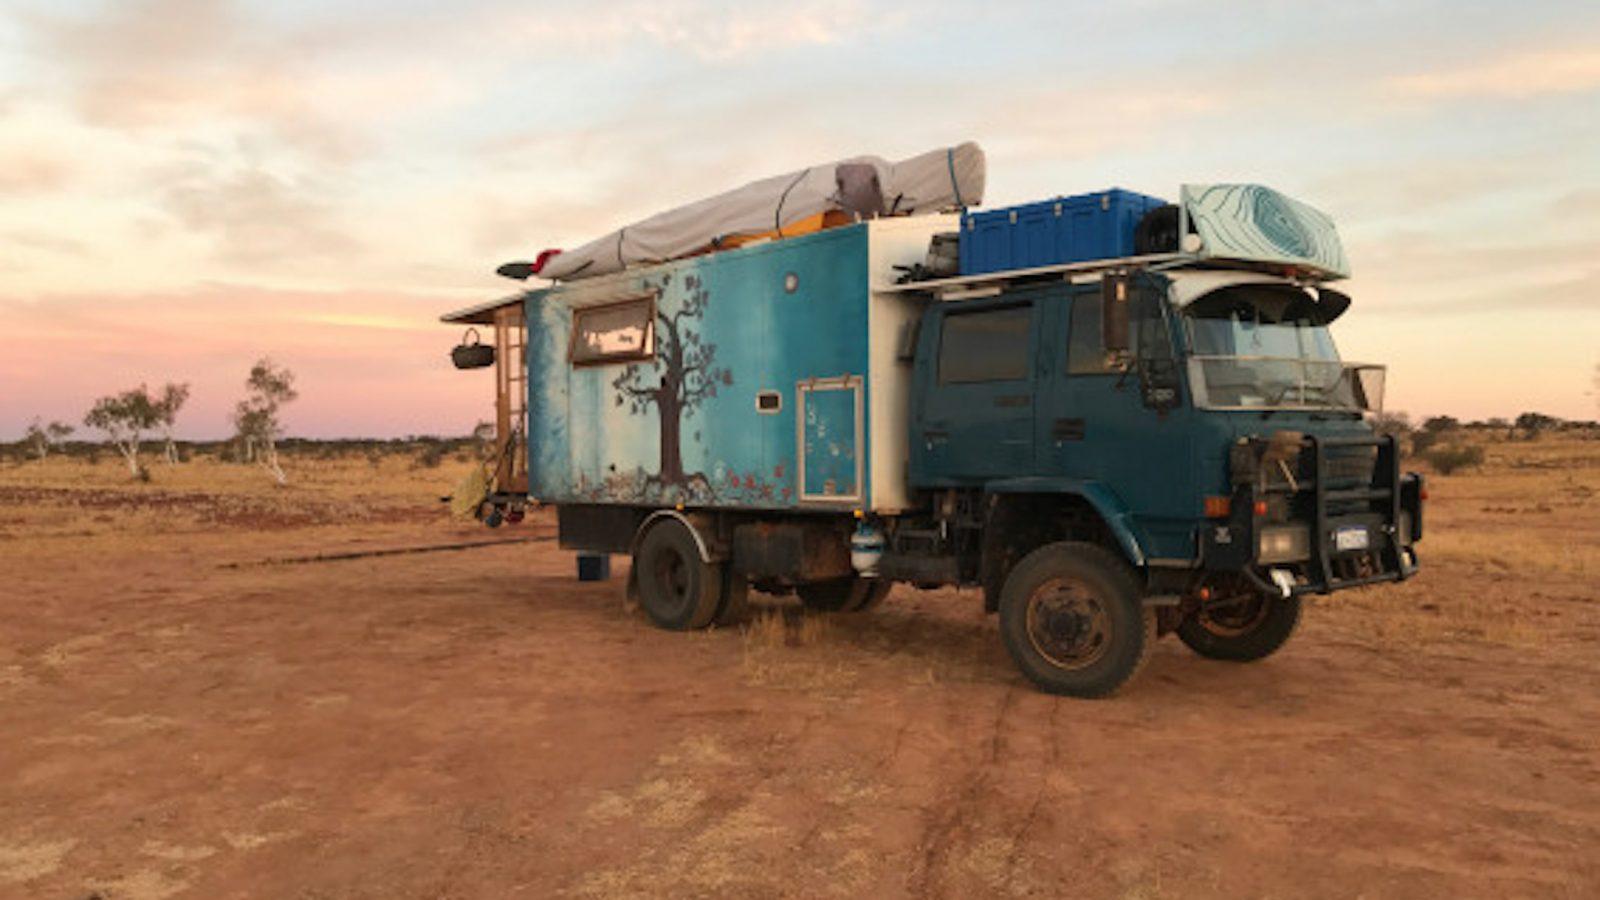 The Nomadics guest blog post for Mycelium - Truck